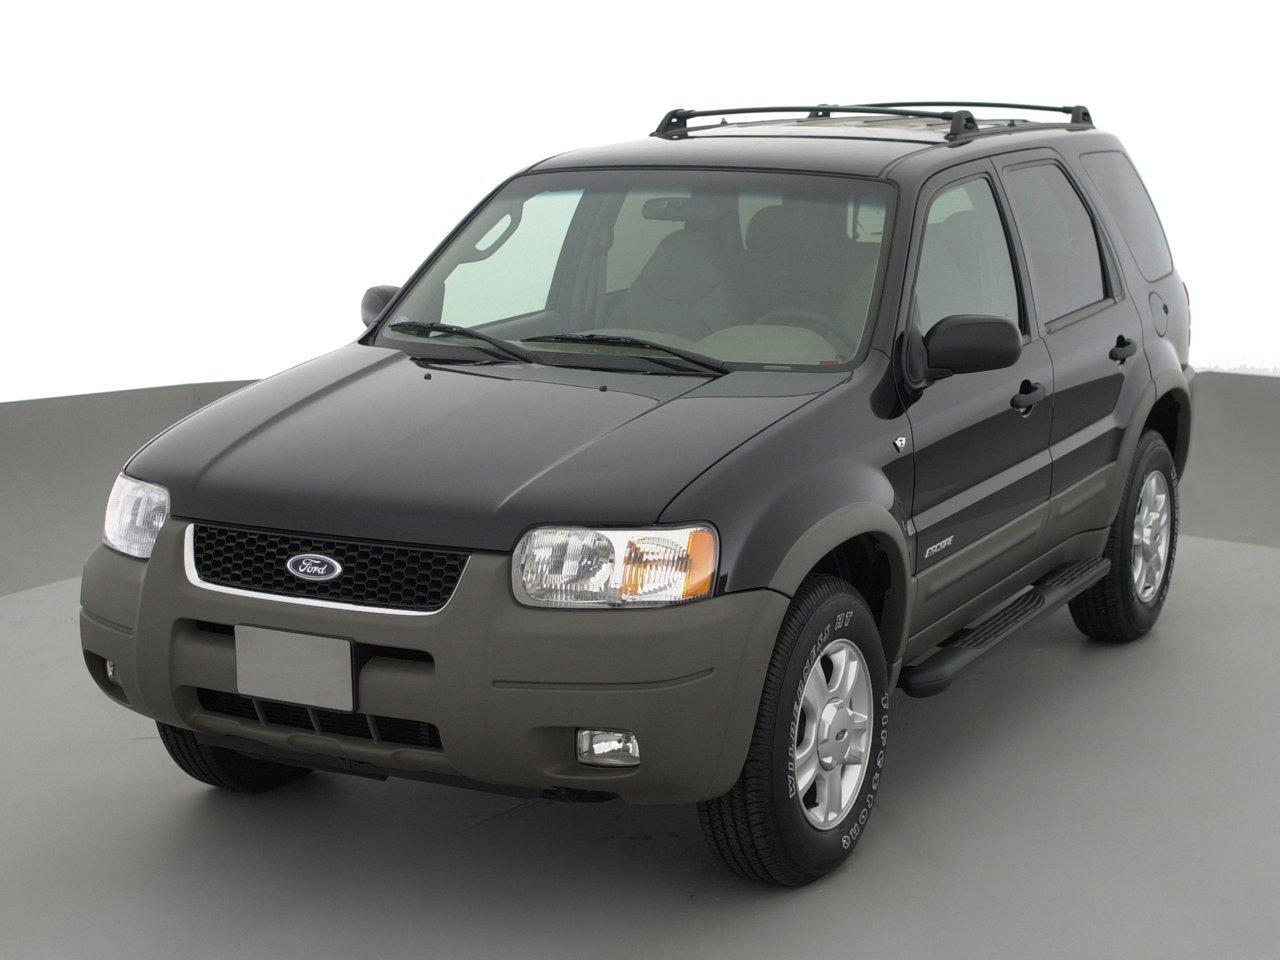 2002 toyota highlander reviews images and specs vehicles. Black Bedroom Furniture Sets. Home Design Ideas